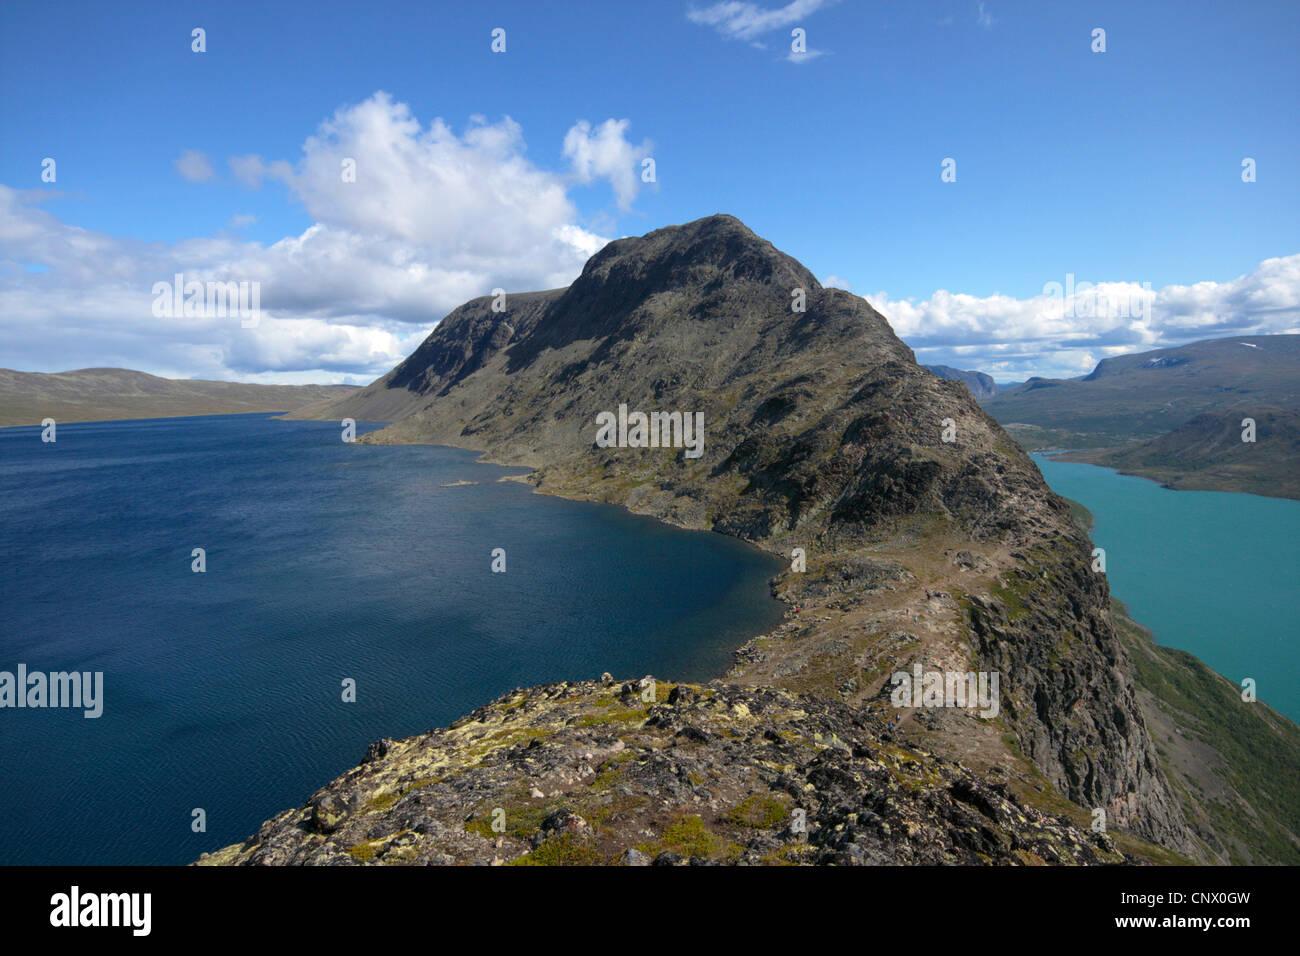 Besseggen ridge with Bessvatnet Lake on the left and Lake Gjende on the right, Norway, Jotunheimen National Park - Stock Image